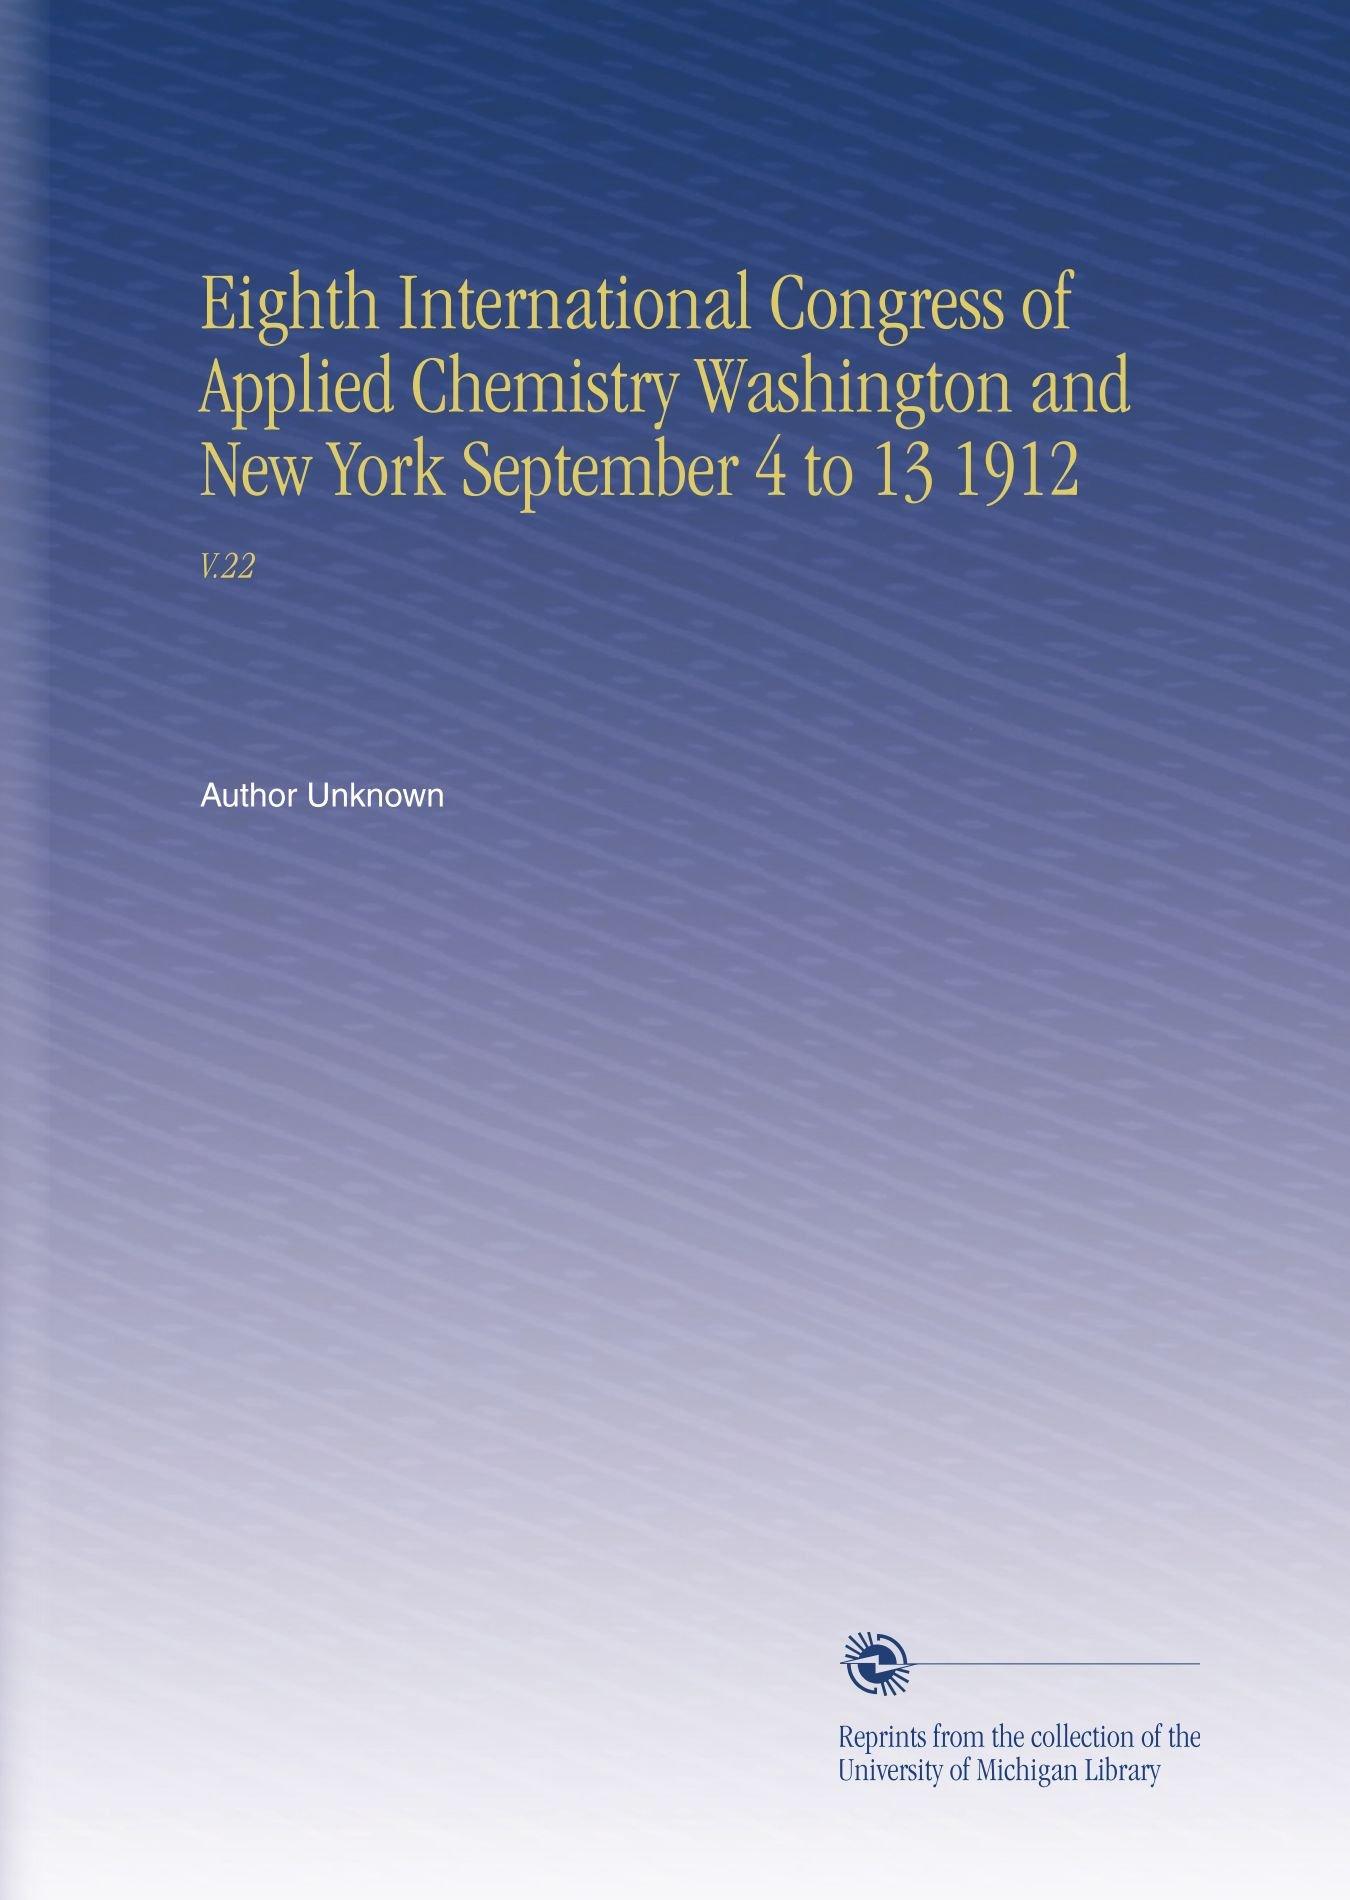 Eighth International Congress of Applied Chemistry Washington and New York September 4 to 13 1912: V.22 pdf